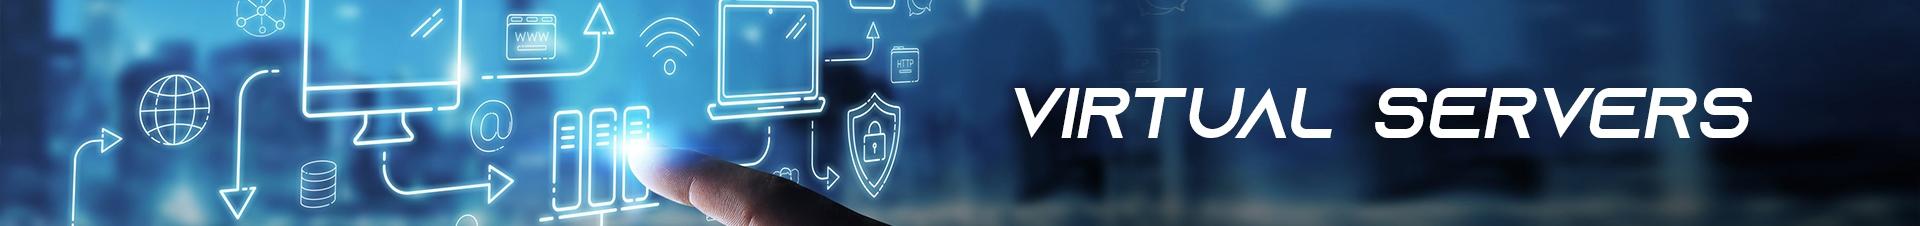 VirtualServers